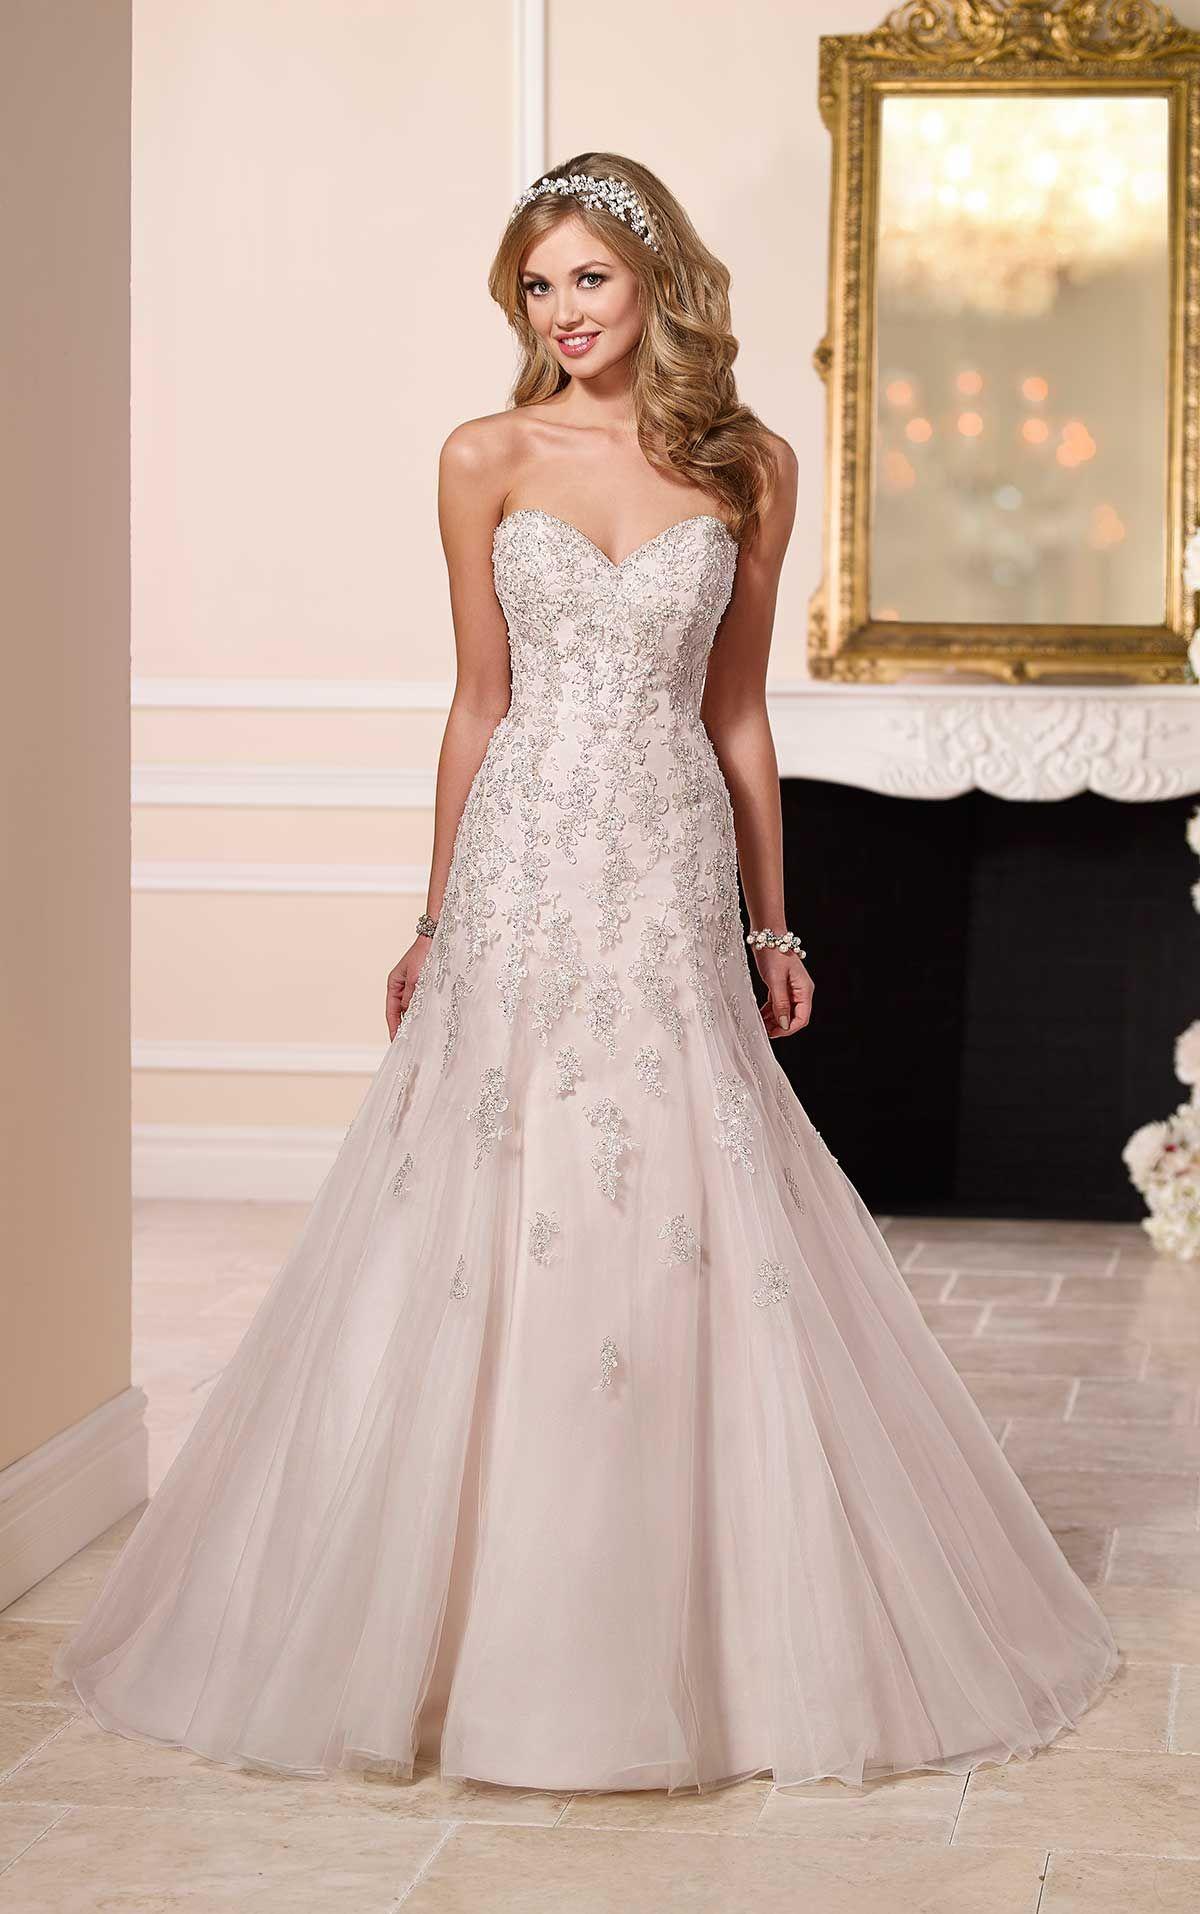 Princess pink wedding ball gown lwedding dress wedding ideas